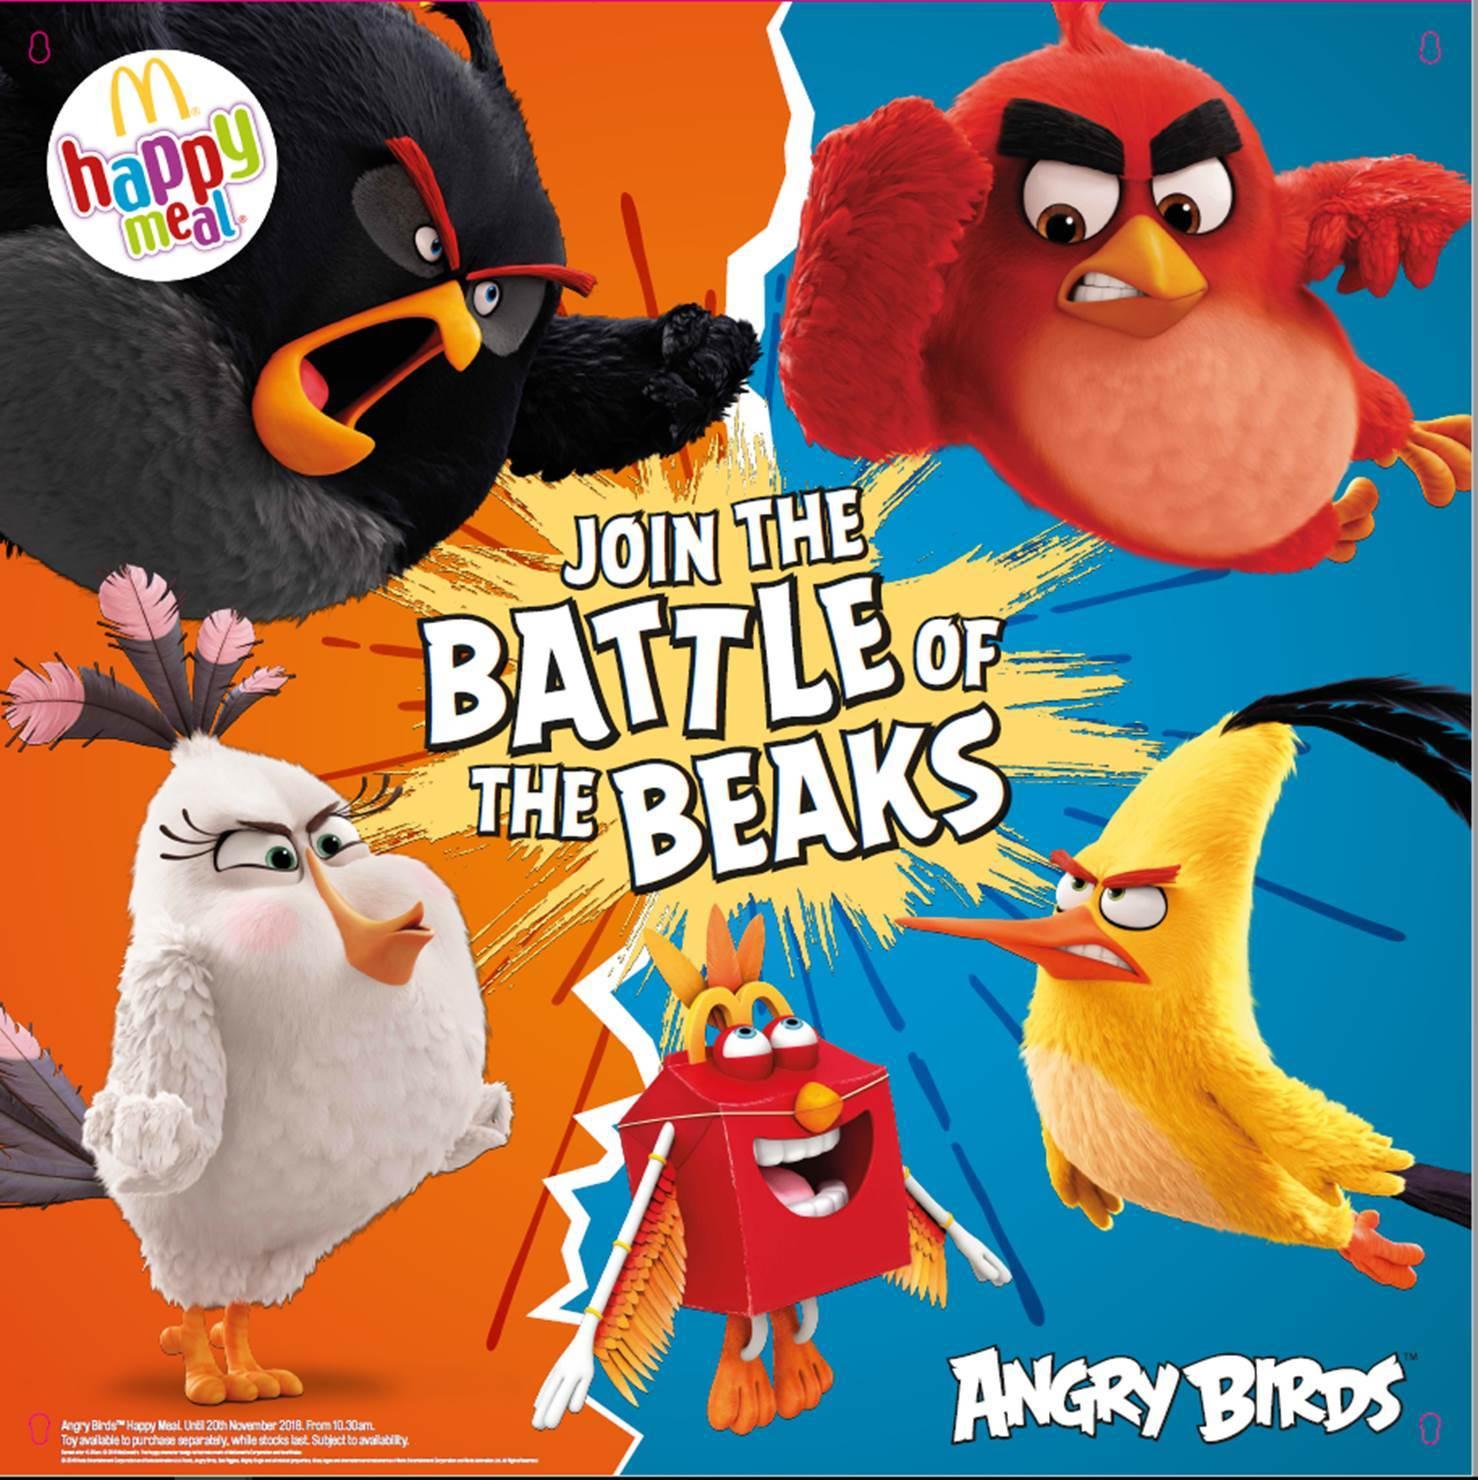 Angry birds poster.jpeg